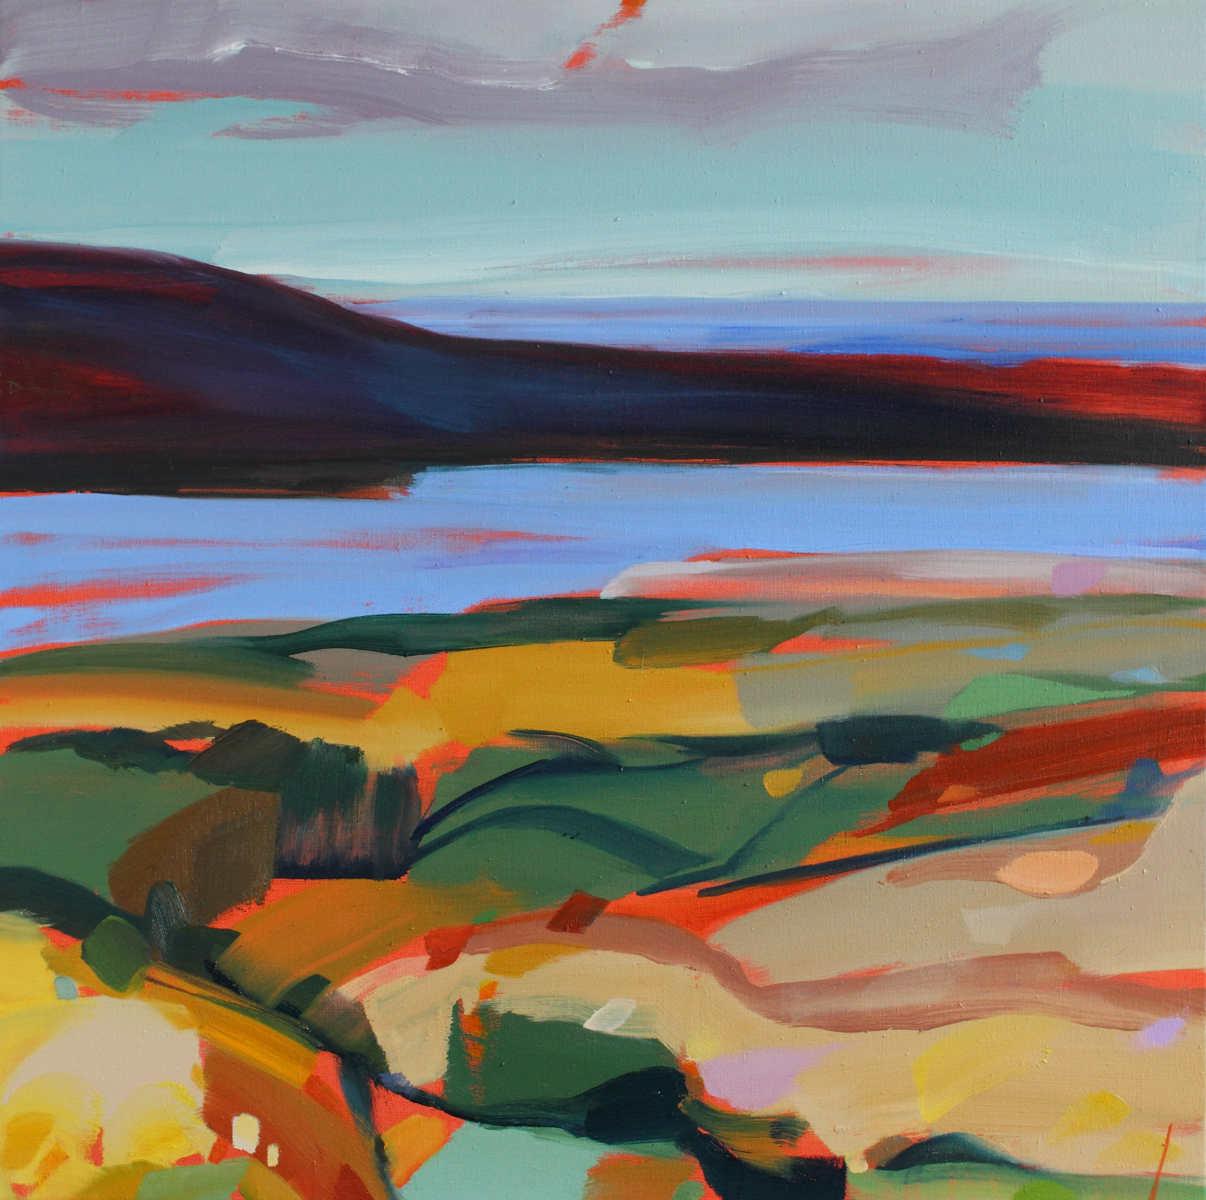 Seascape titled Distant Sea by Shona Barr